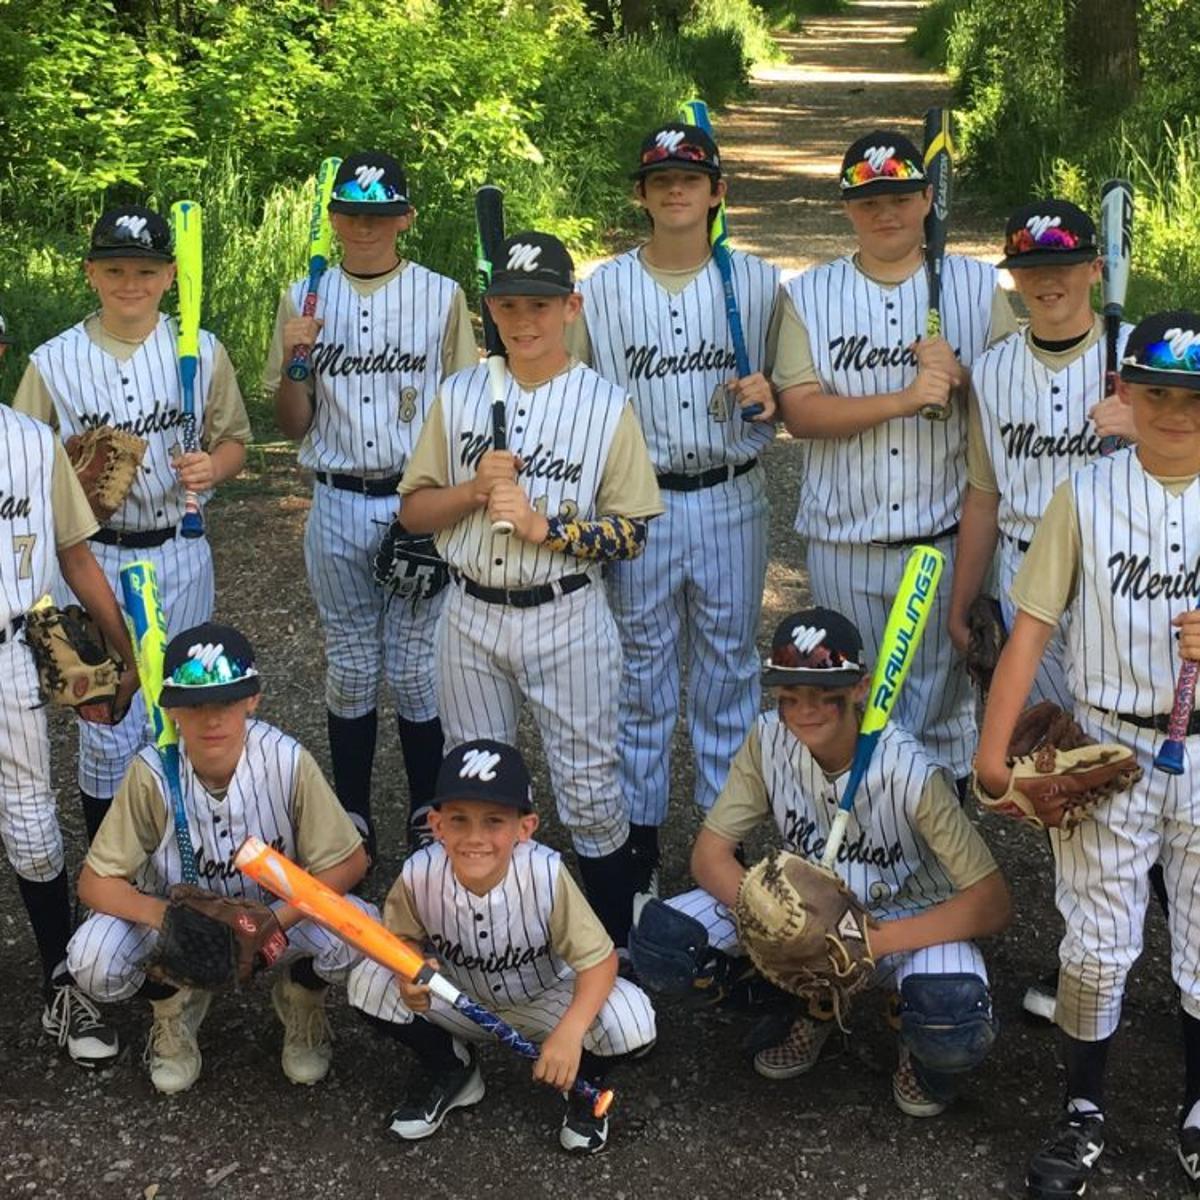 Meridian Youth Baseball team goes to Cal Ripken World Series